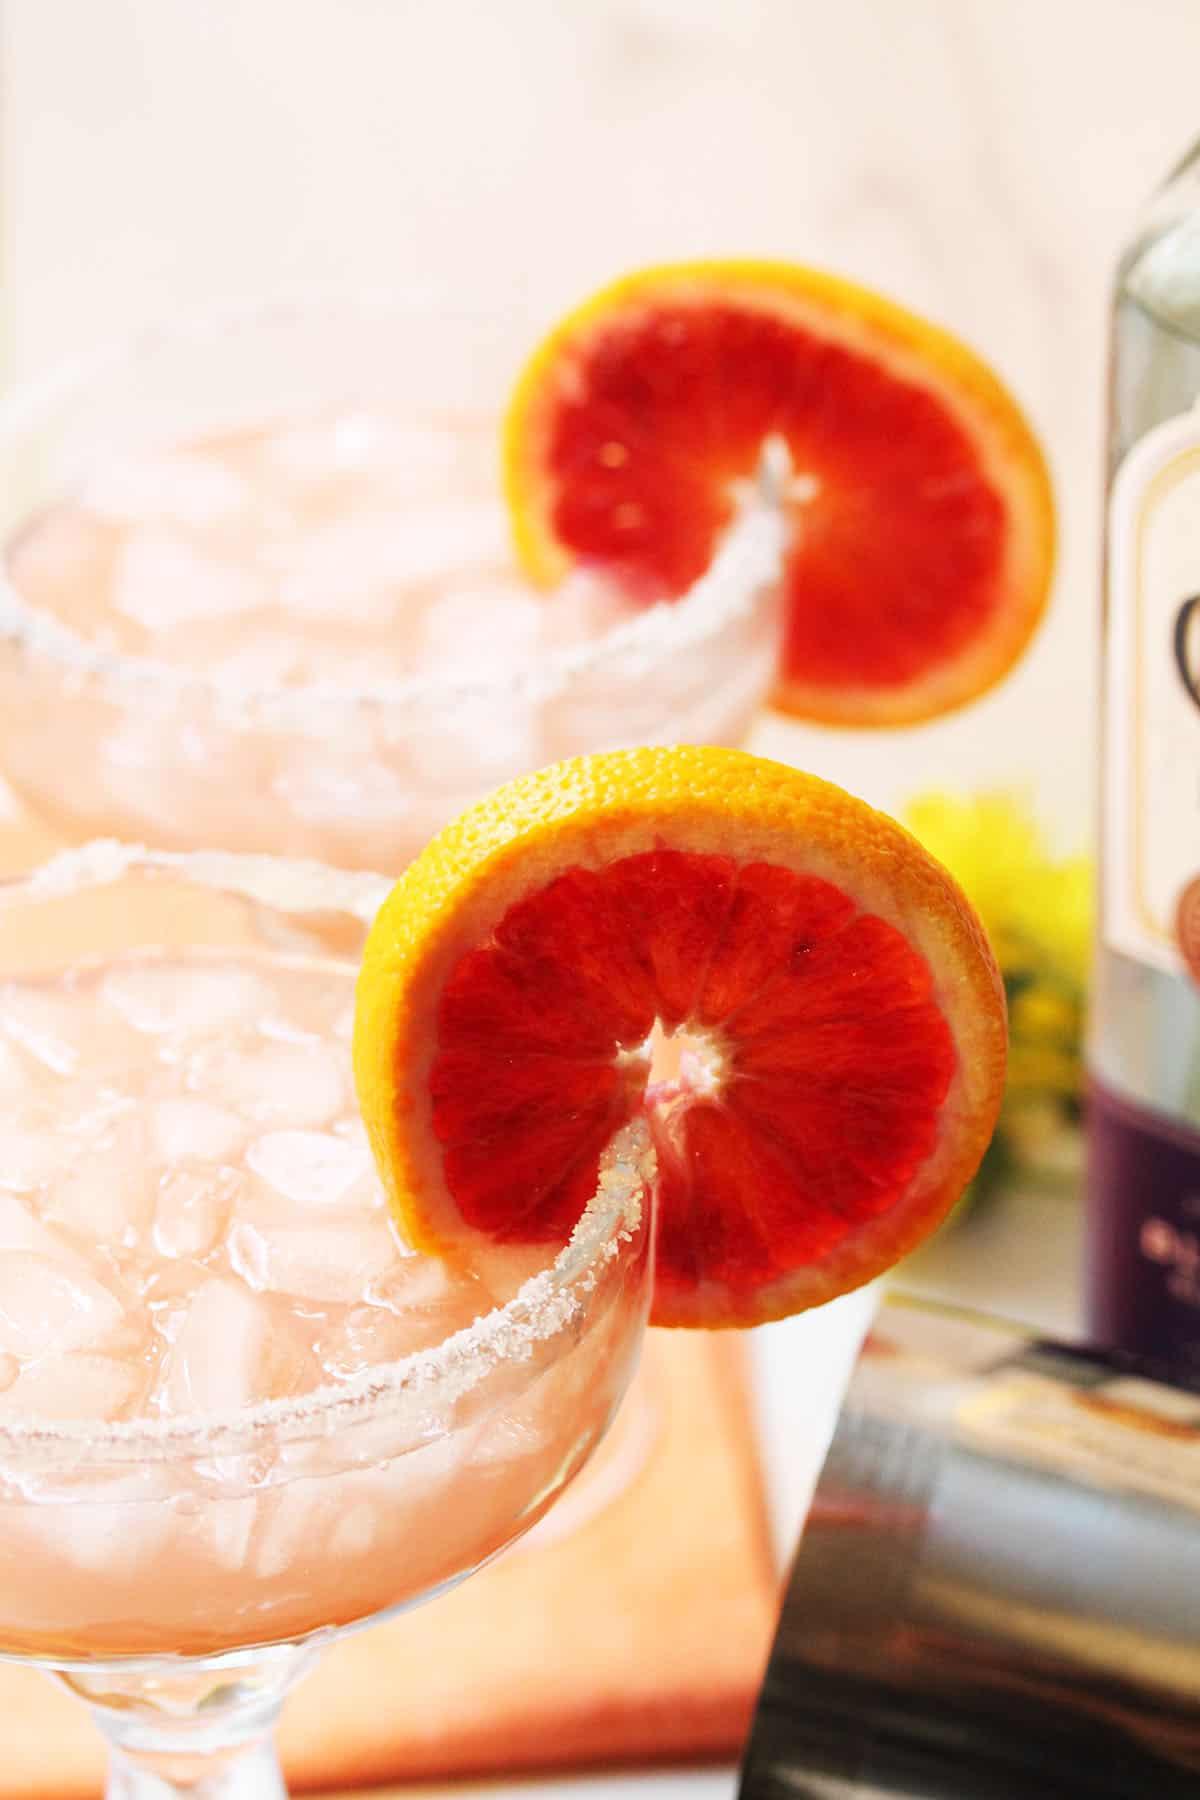 Closeup of partial top of cocktail glasses showing sugar rim and blood orange slice garnish.